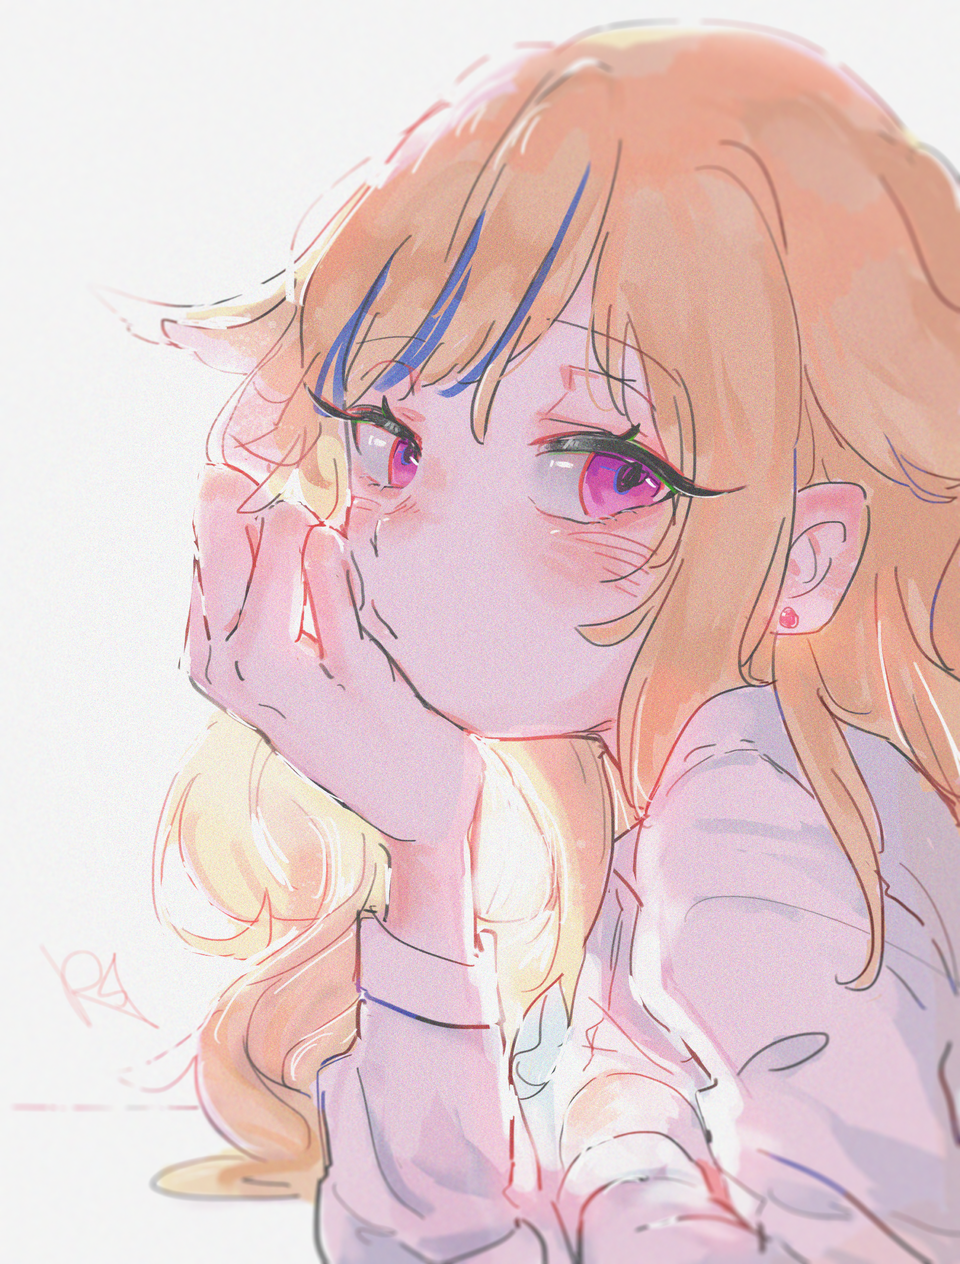 Illust of RSazu virtual_YouTuber illustration ヒメヒナ art himehina